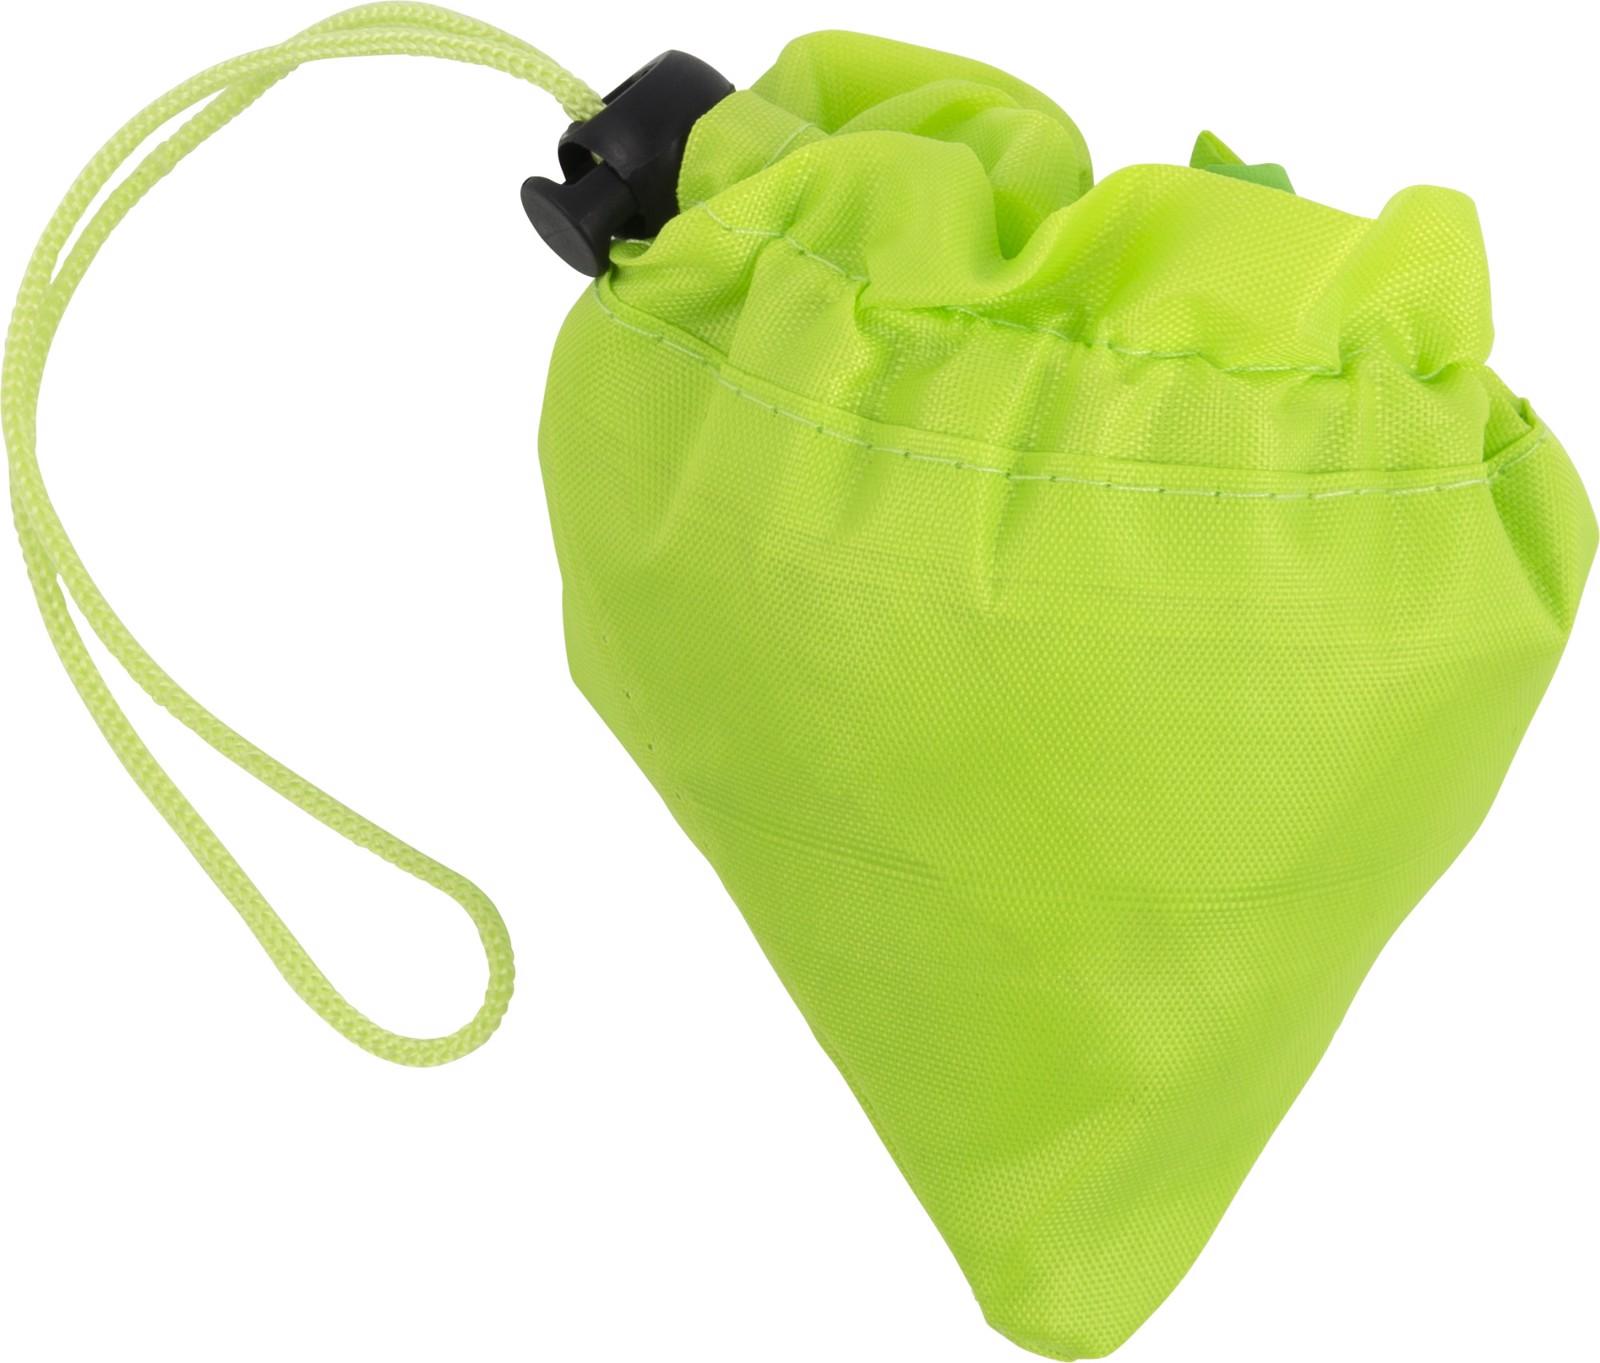 Polyester (210D) shopping bag - Lime